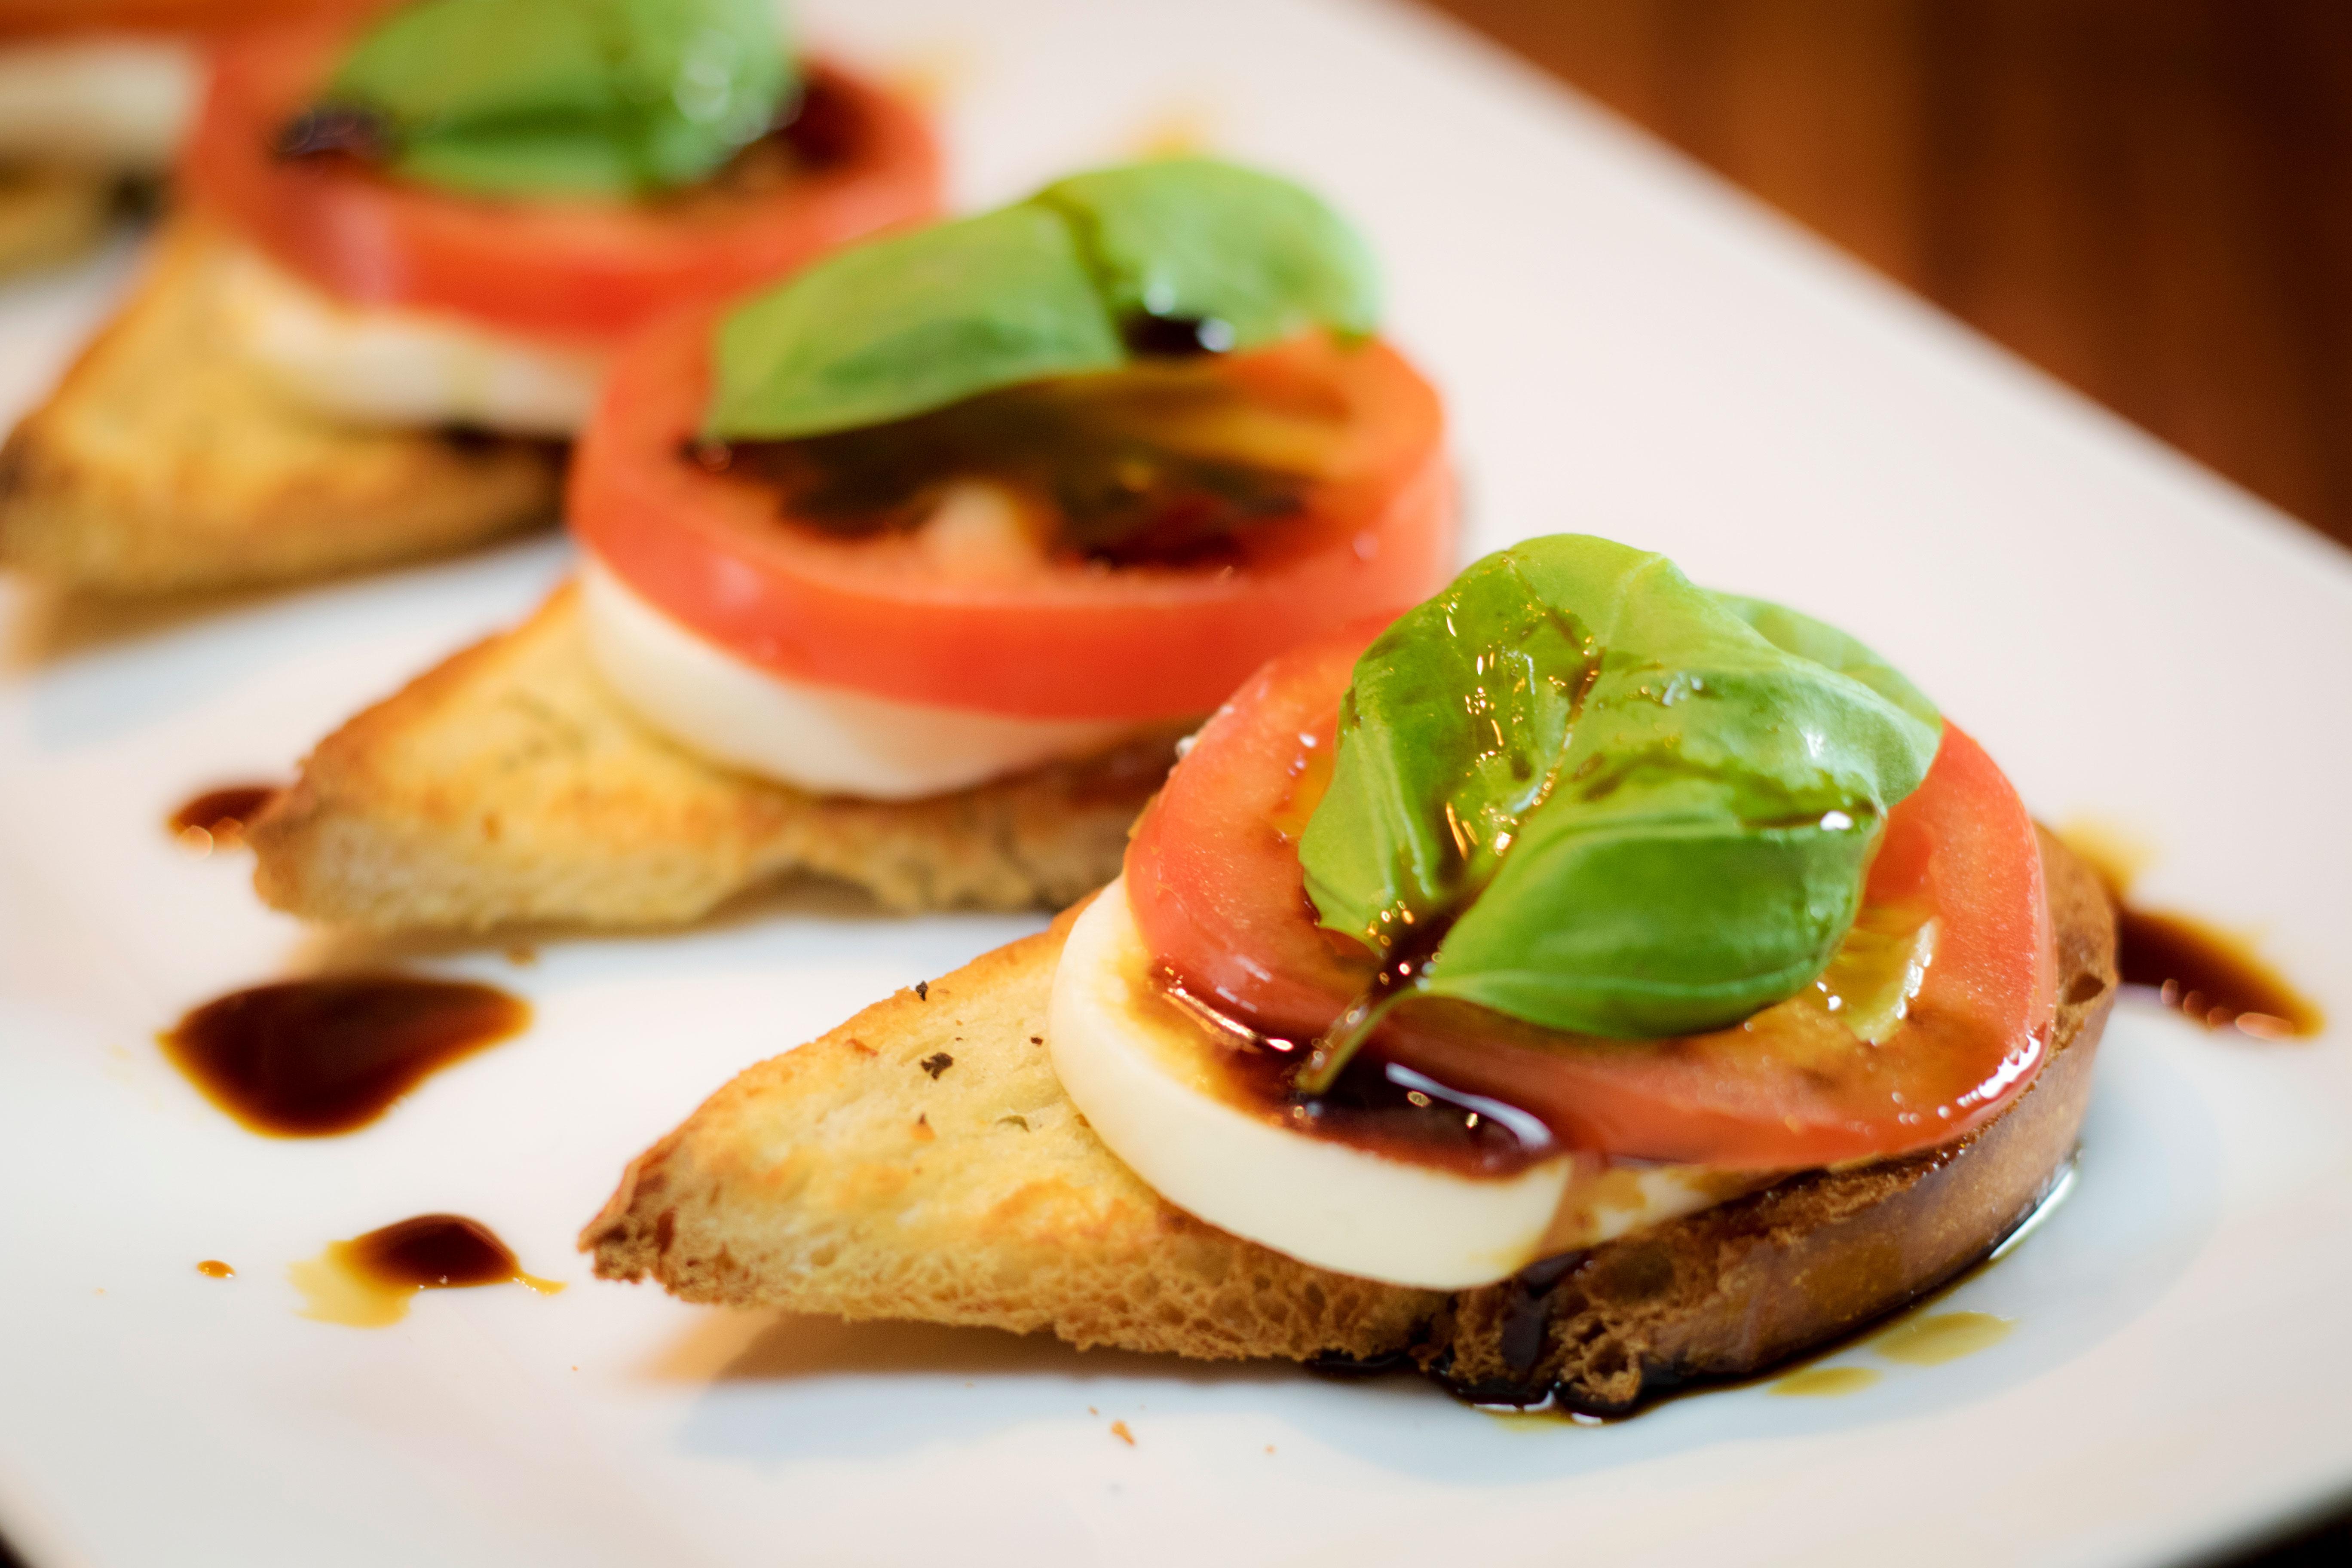 Buy parmesan basil garlic butter online.